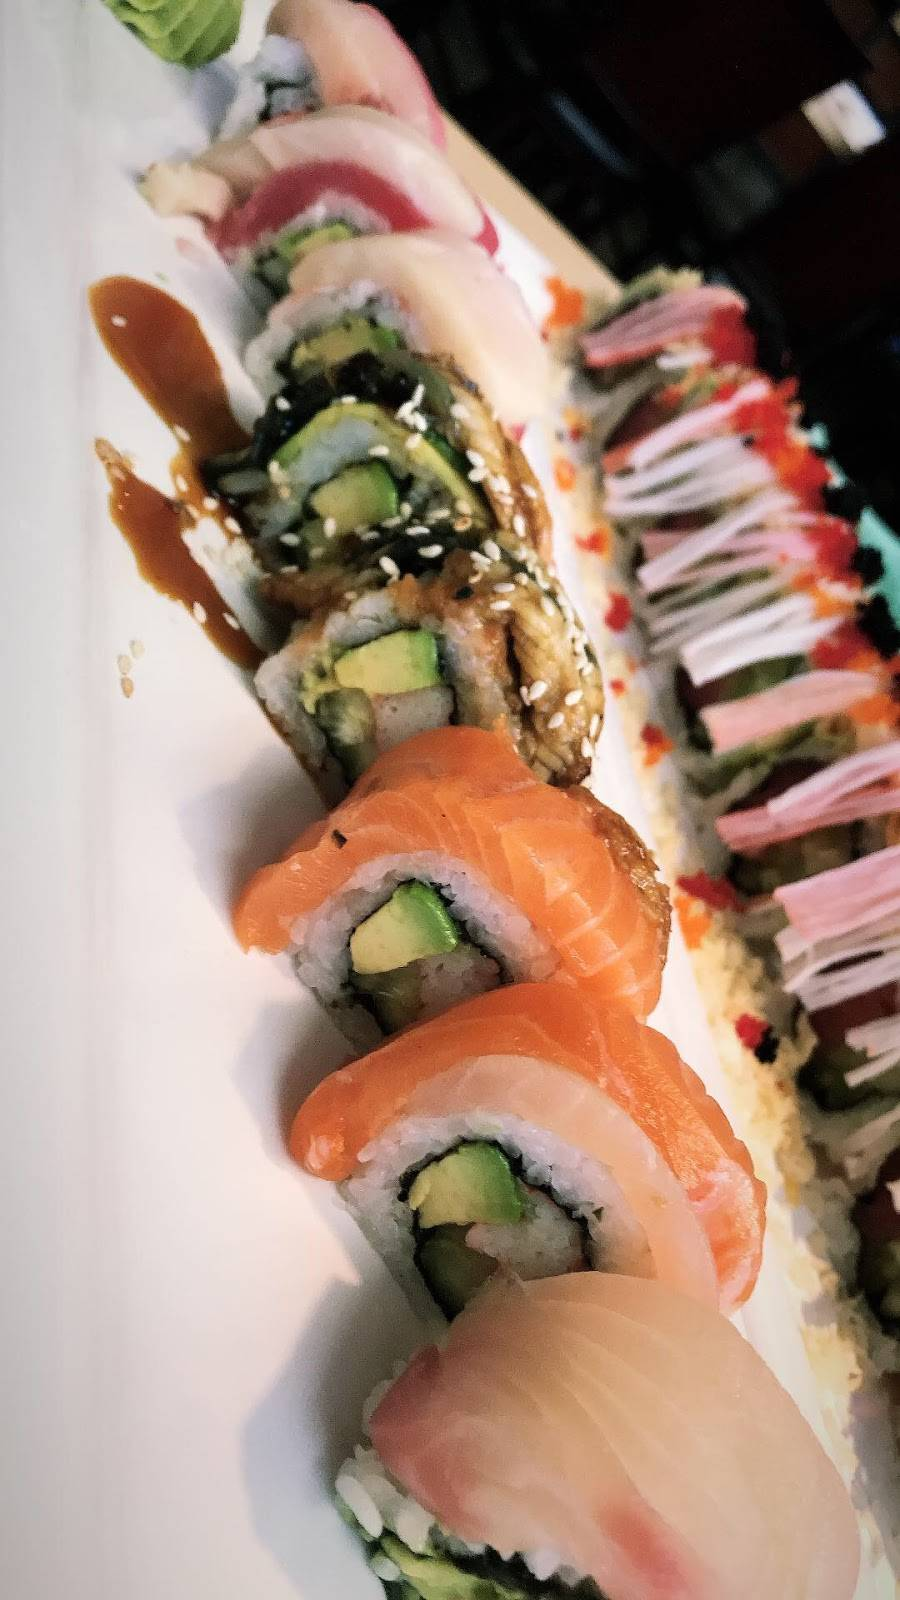 Origami Sushi - Home - Tampa, Florida - Menu, Prices, Restaurant ... | 1600x900